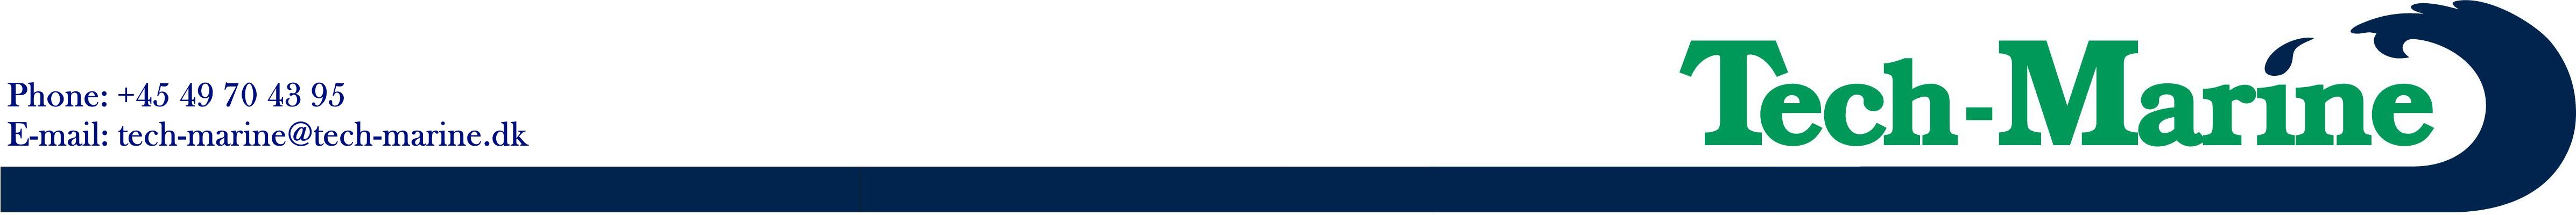 Tech-Marine Logo